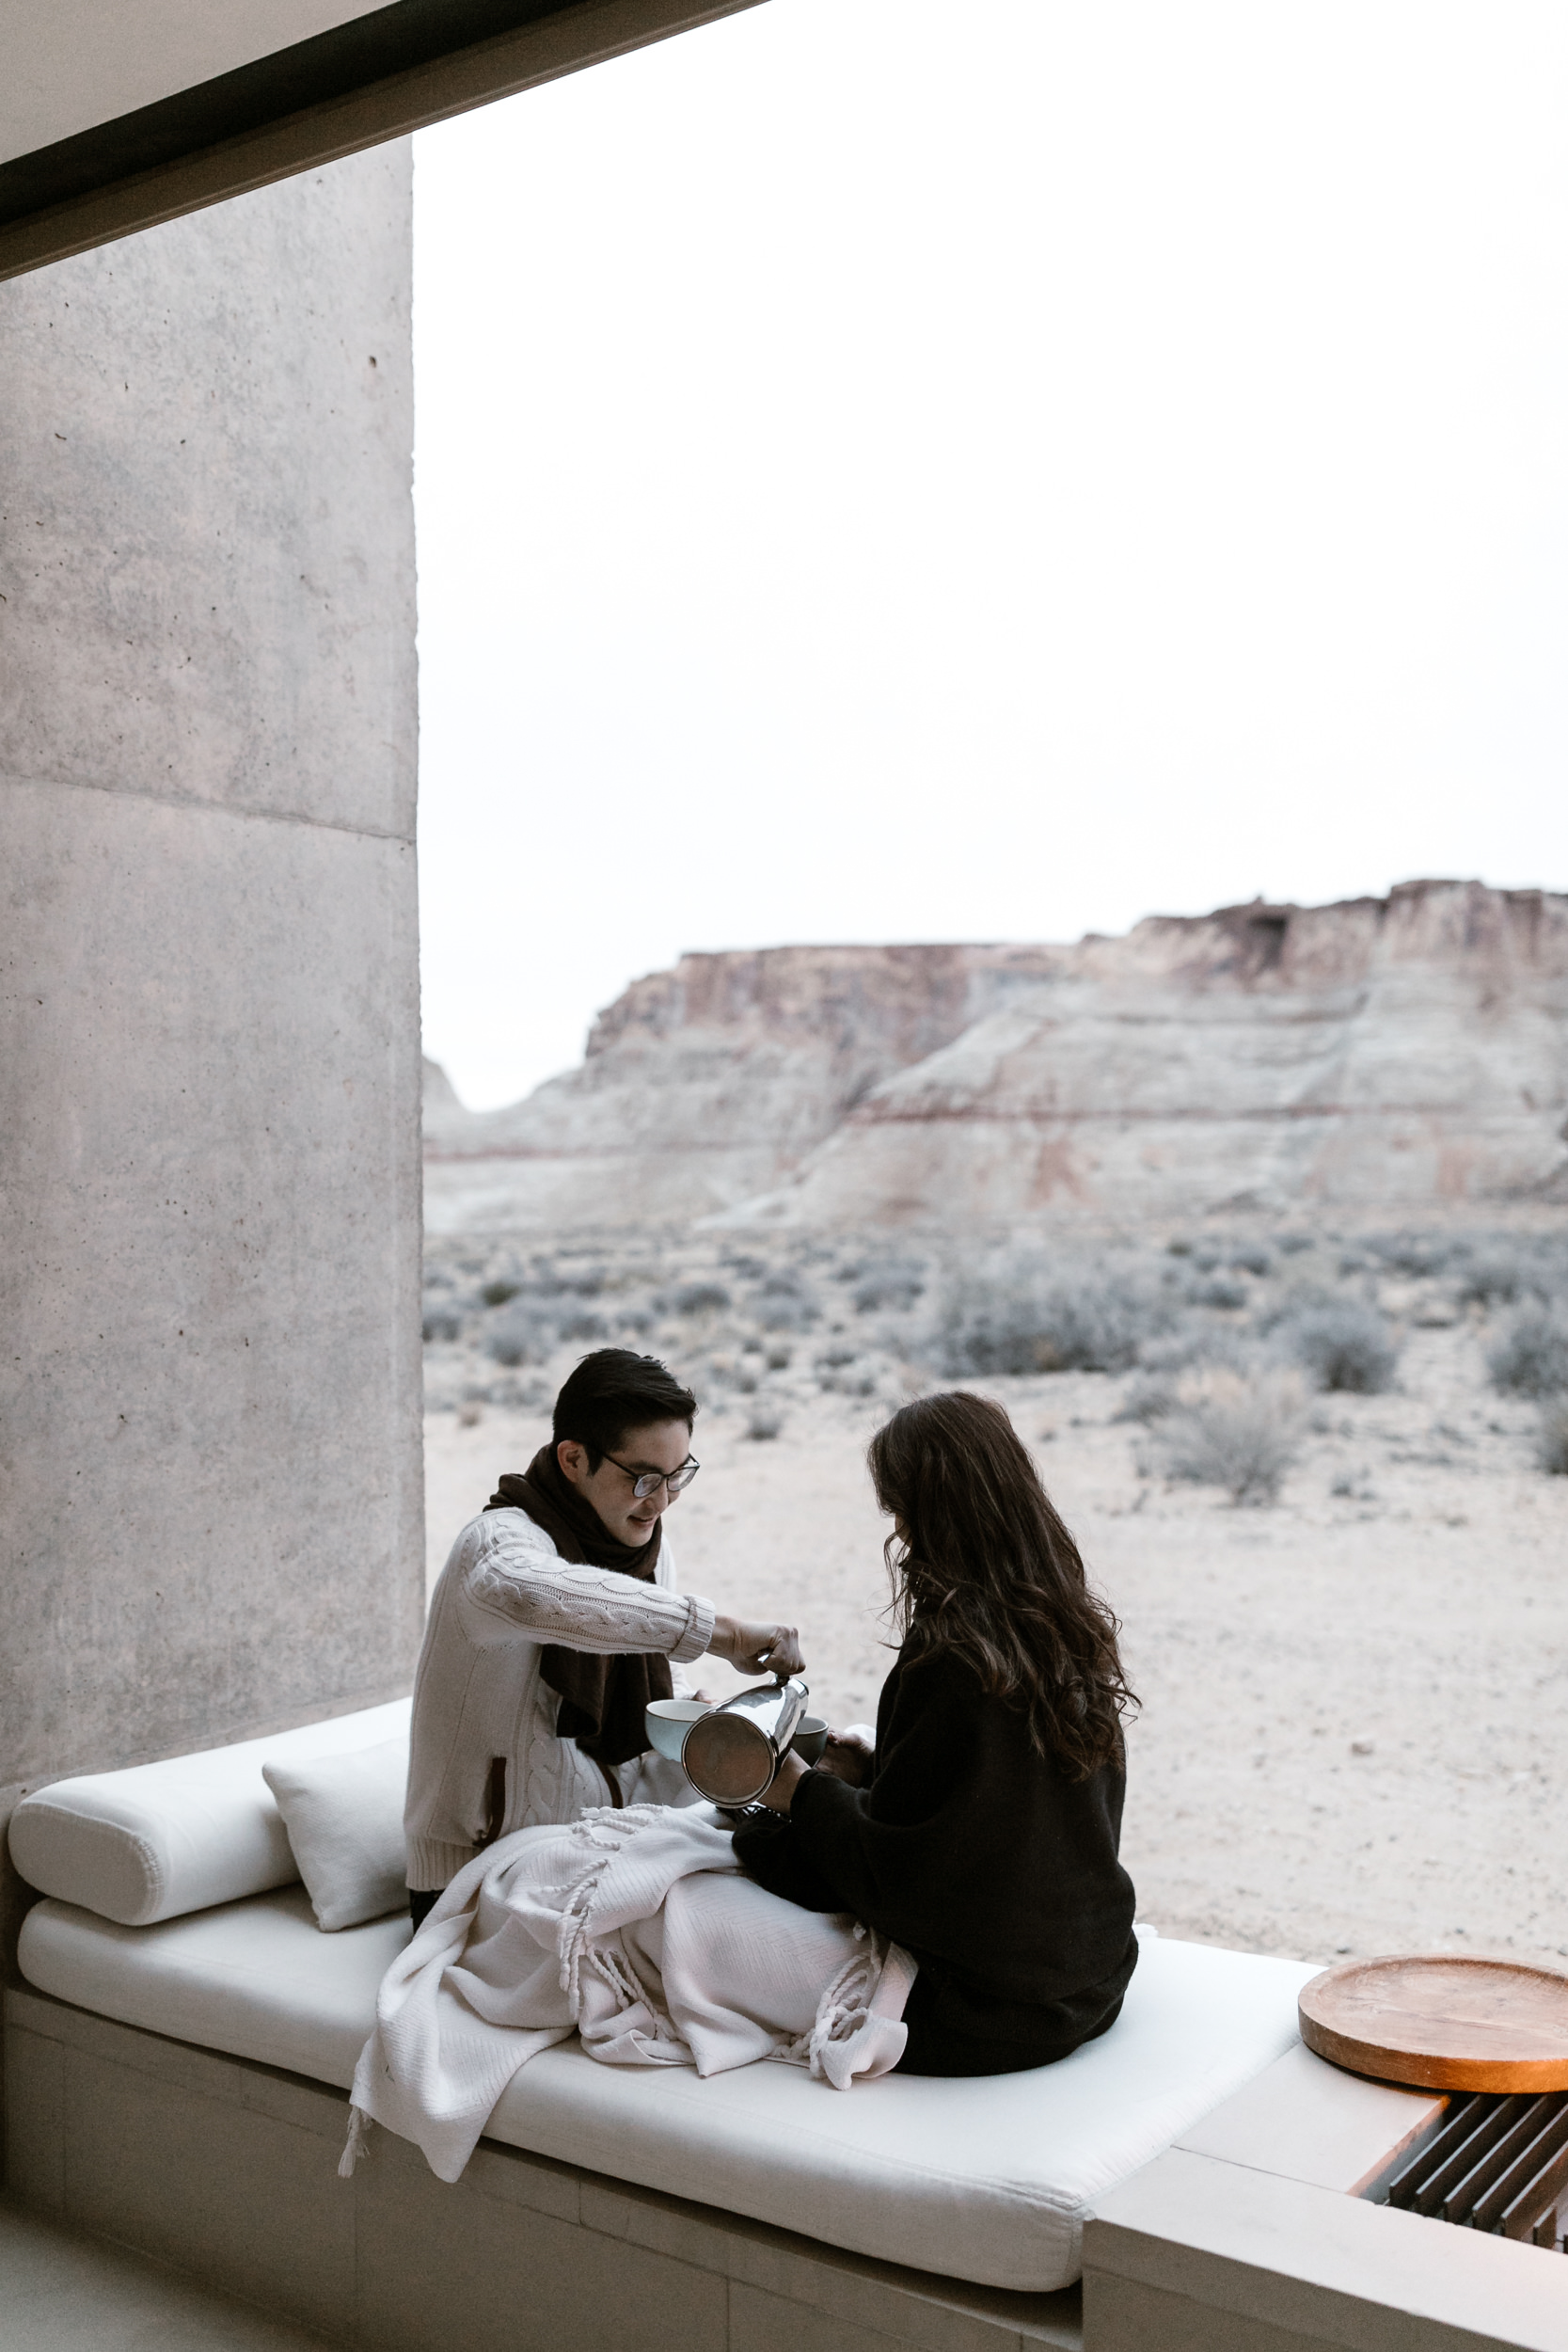 travel couple having their honeymoon at amangiri luxury resort in utah